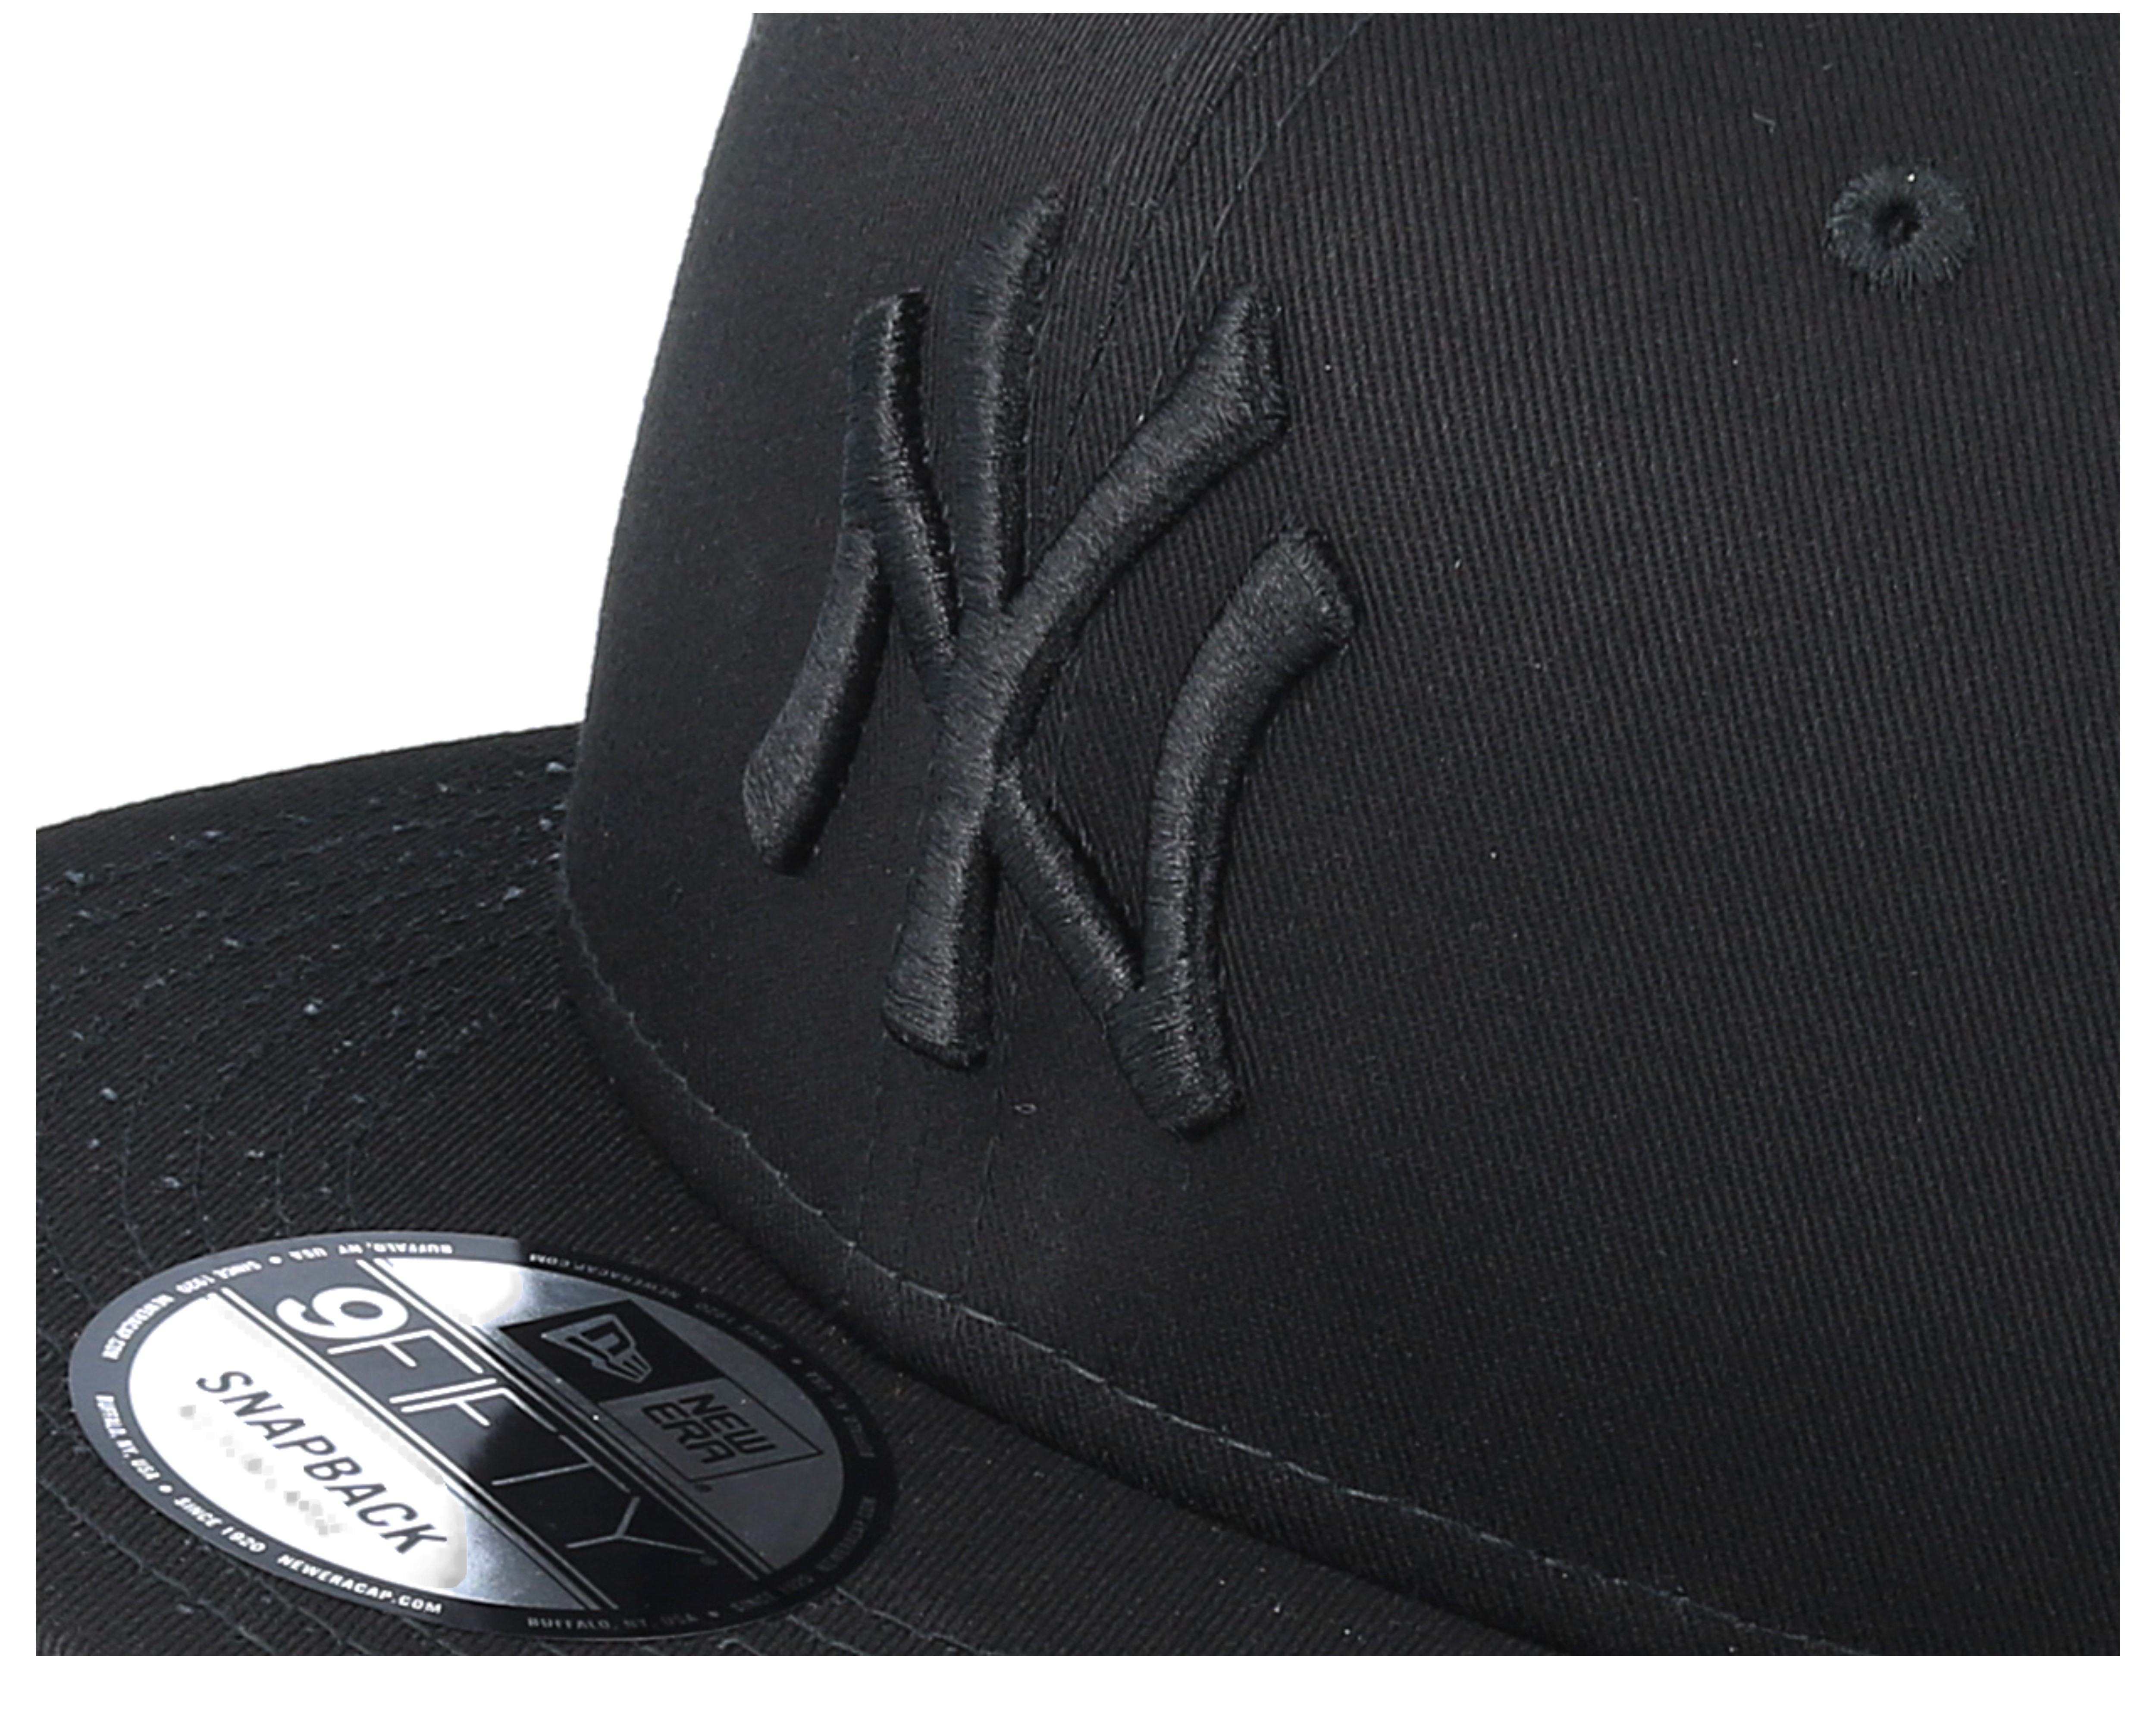 855d44b92 ... discount code for ny yankees black black 9fifty snapback new era caps  hatstore caba6 c7f91